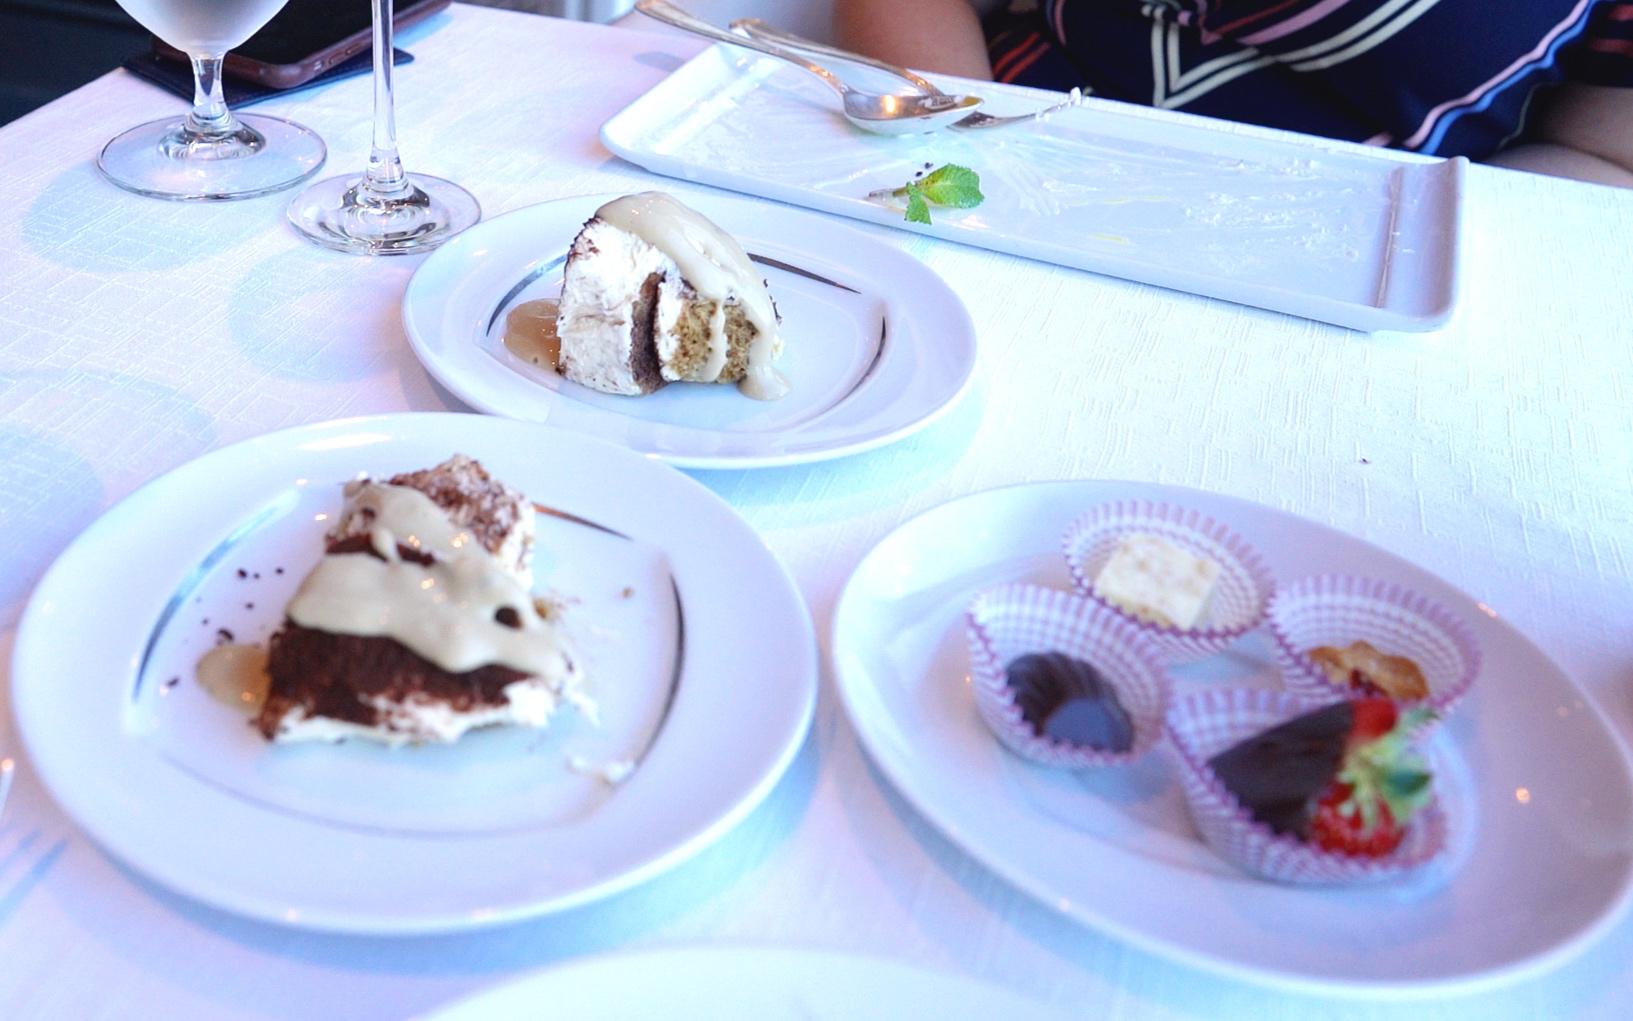 Tiramisu, petit fours and a very clean dessert plate!